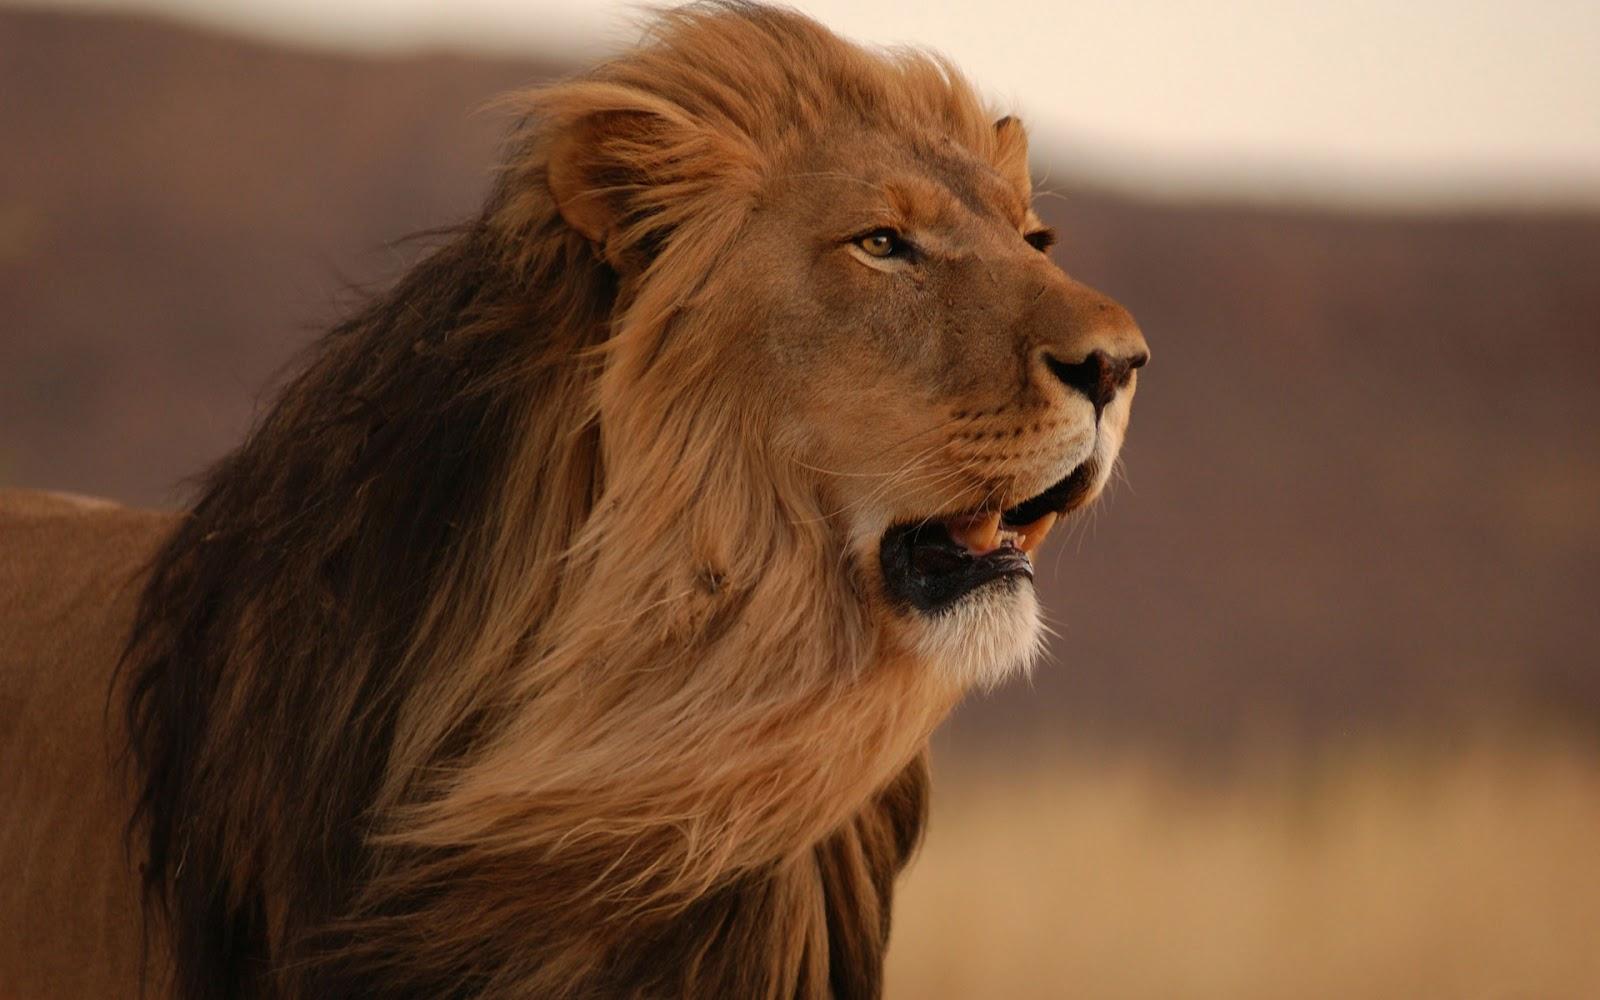 Angry Lion Wallpaper Hd 1080p الامراض الشائعة لمواليد برج الاسد الراقية